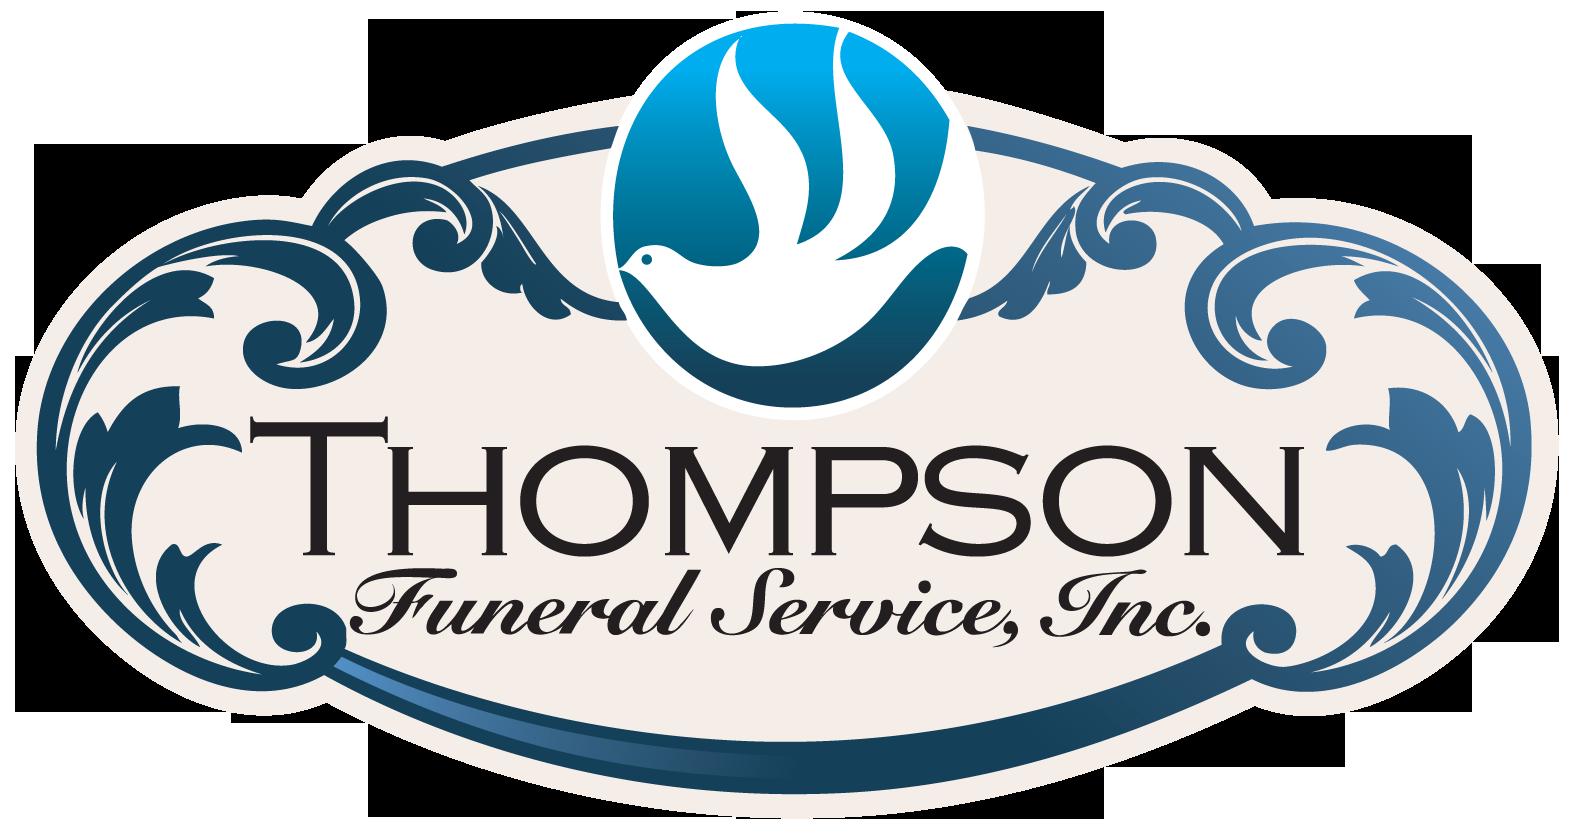 Thompson-Meeker Funeral Home